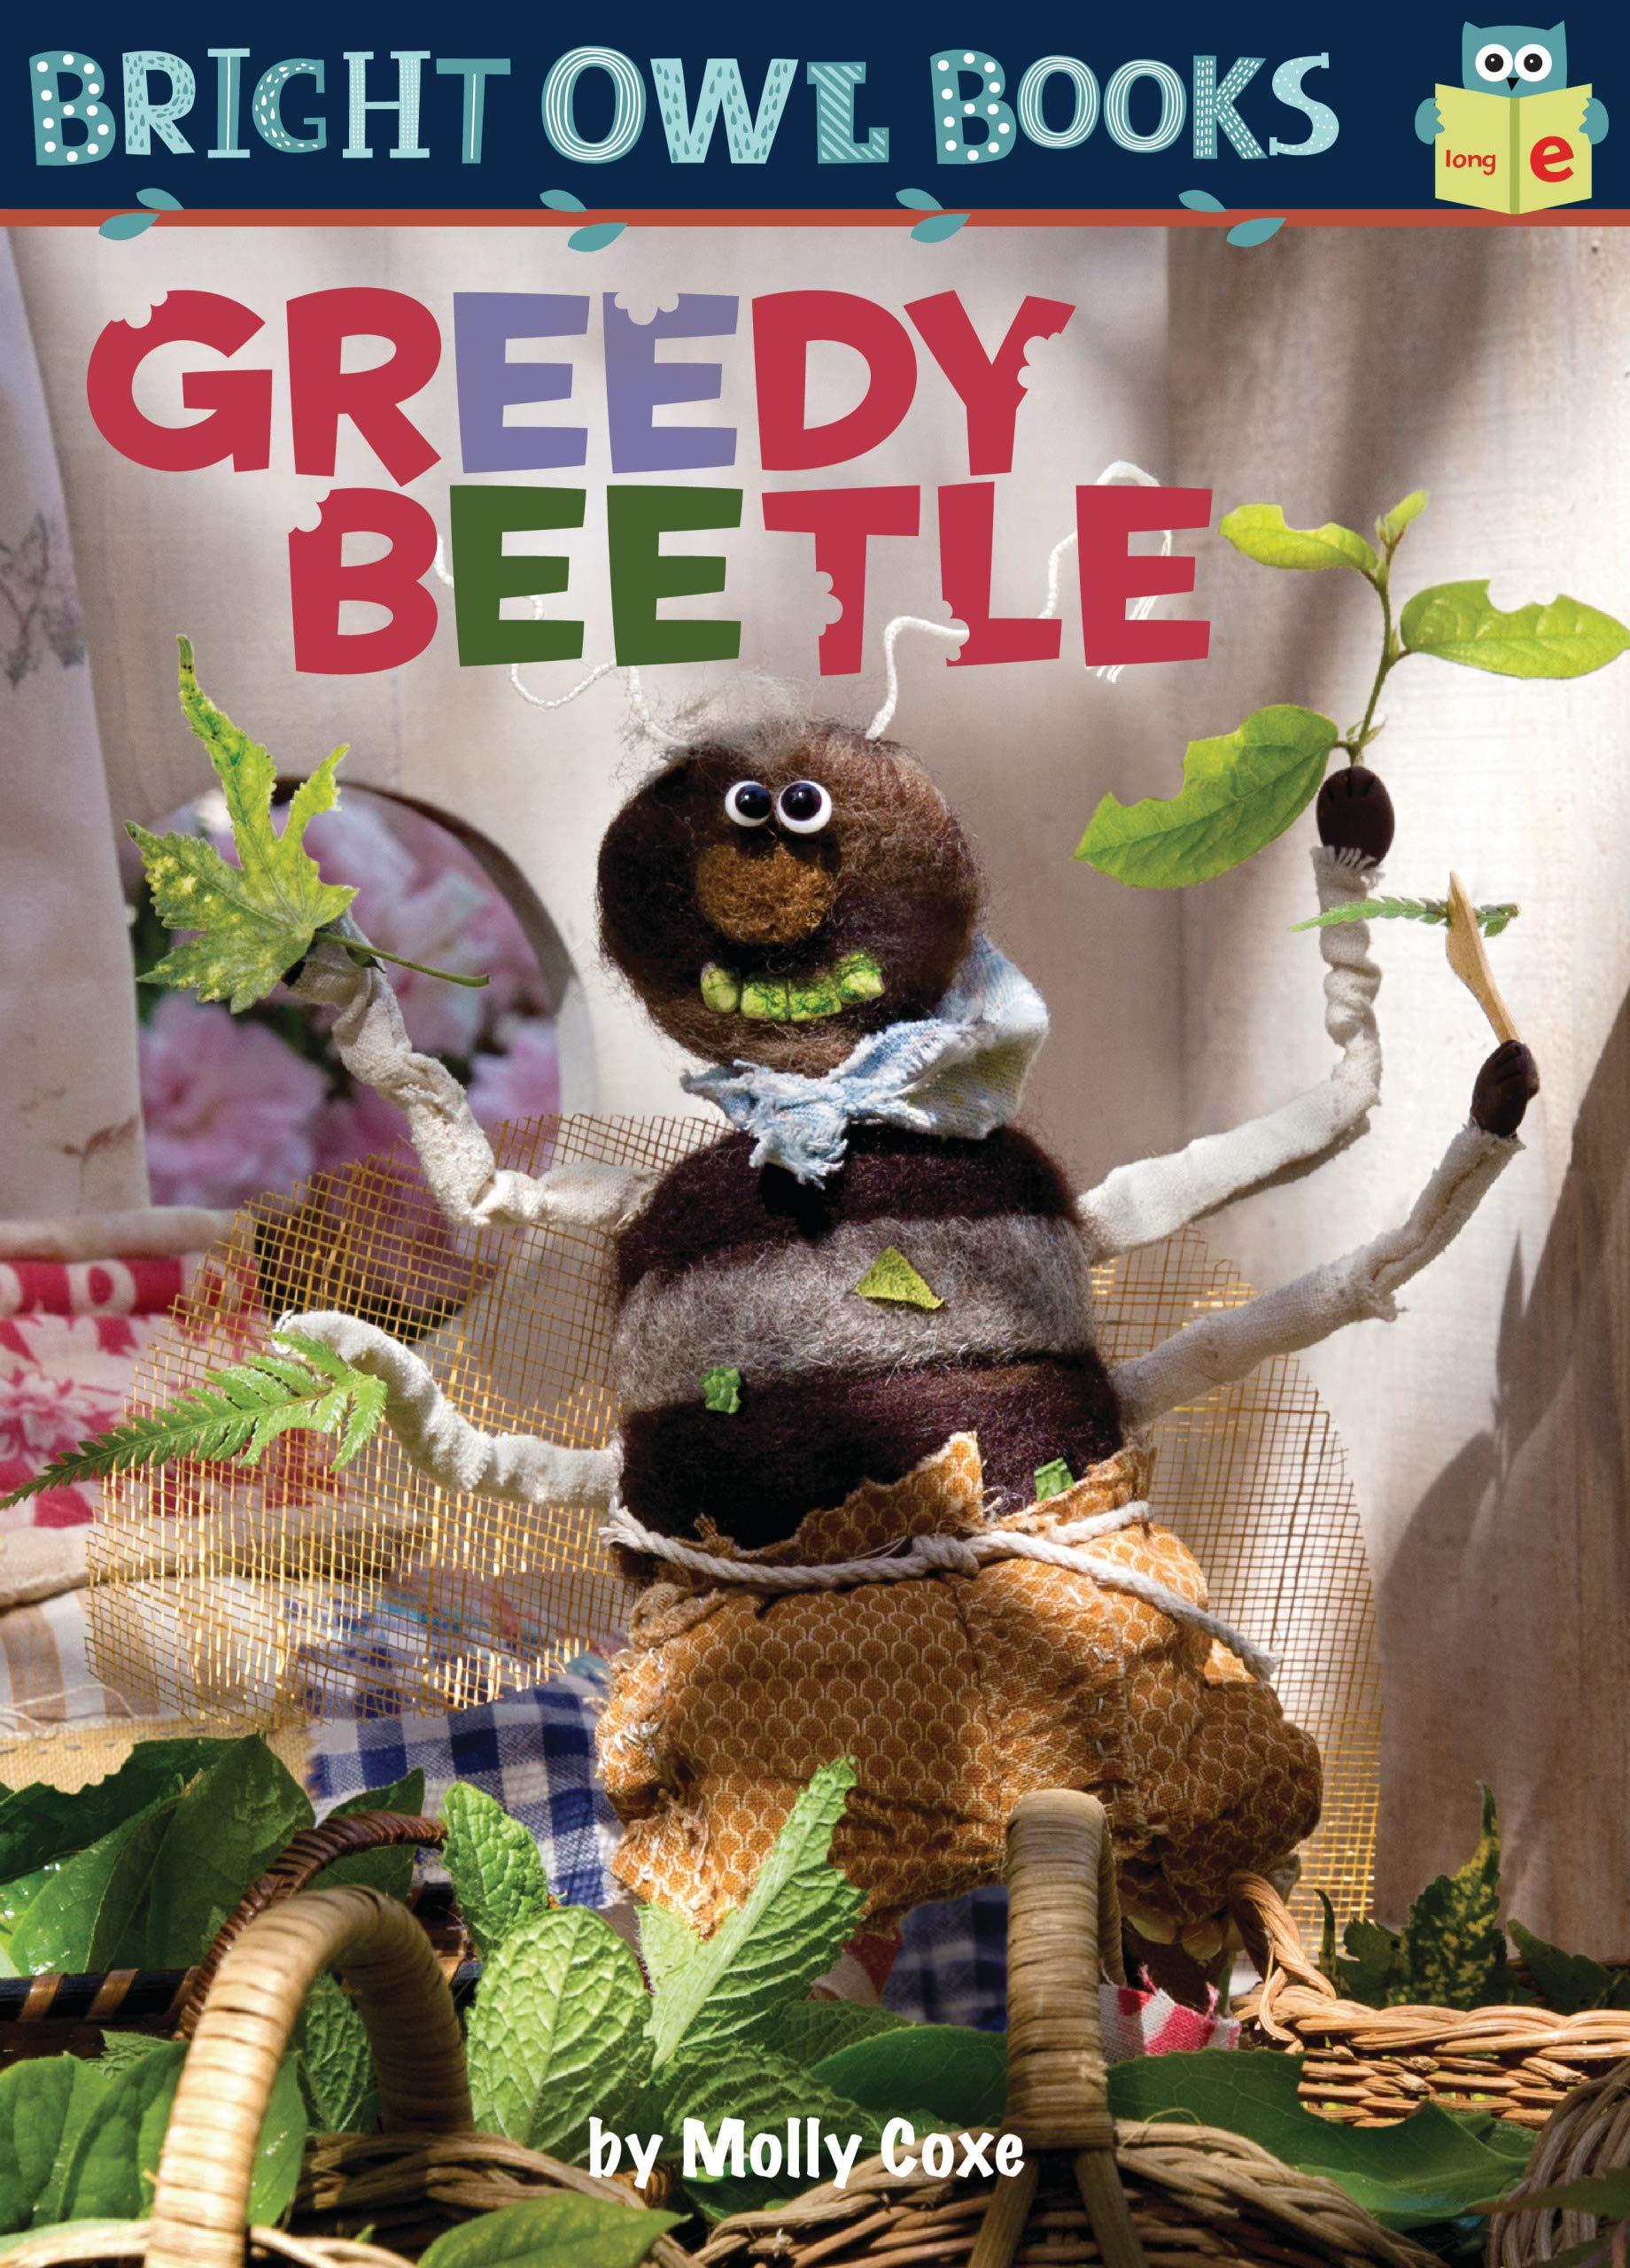 Greedy Beetle: Long Vowel E (Bright Owl Books)